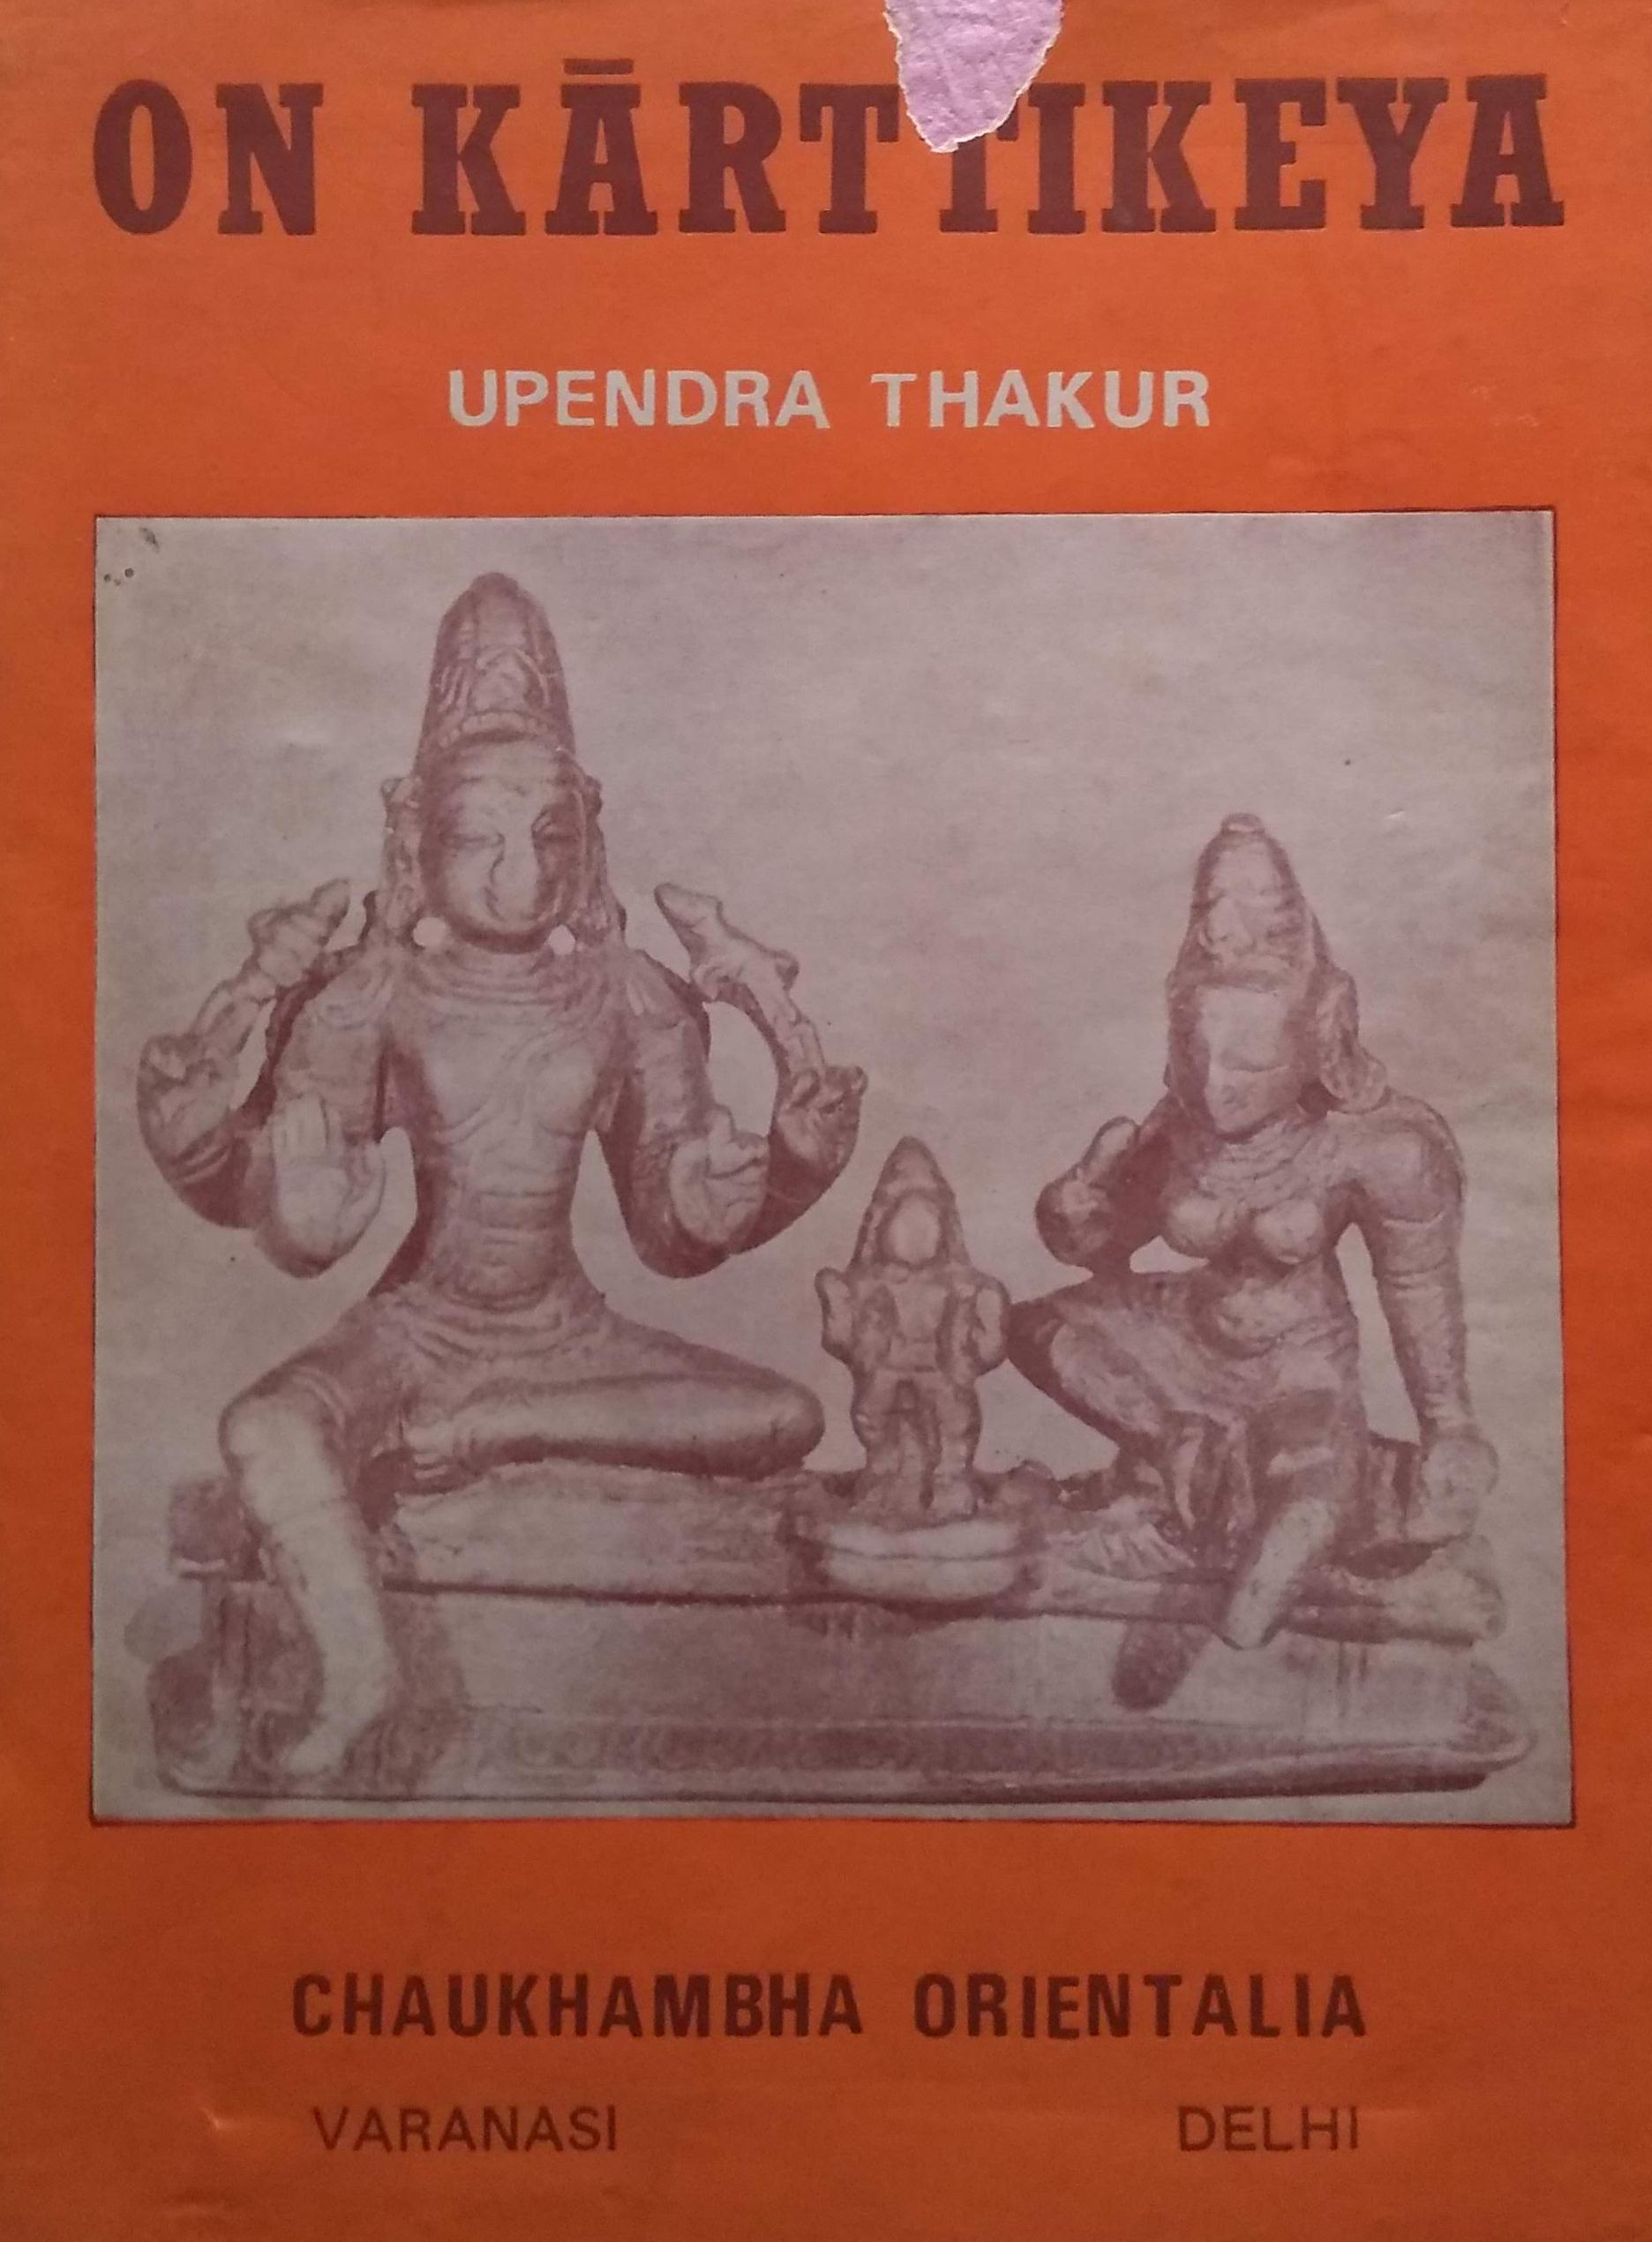 On Kartikeya